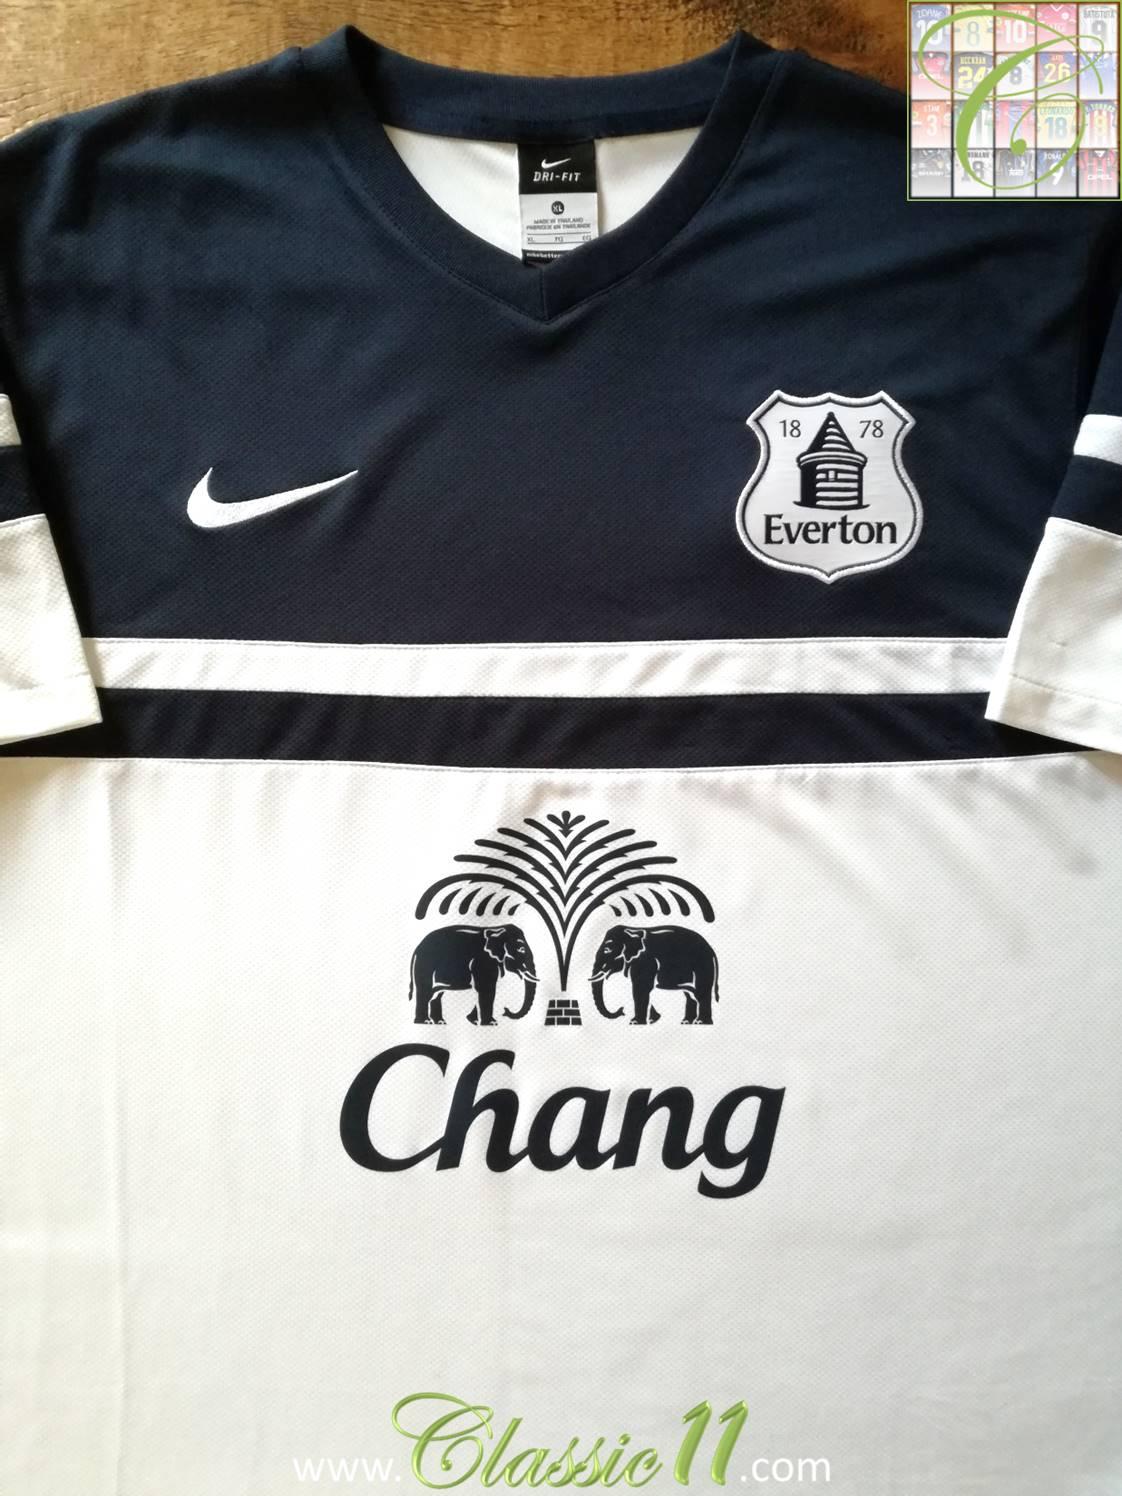 buy popular fc985 8dada Everton Third camisa de futebol 2013 - 2014. Sponsored by Chang